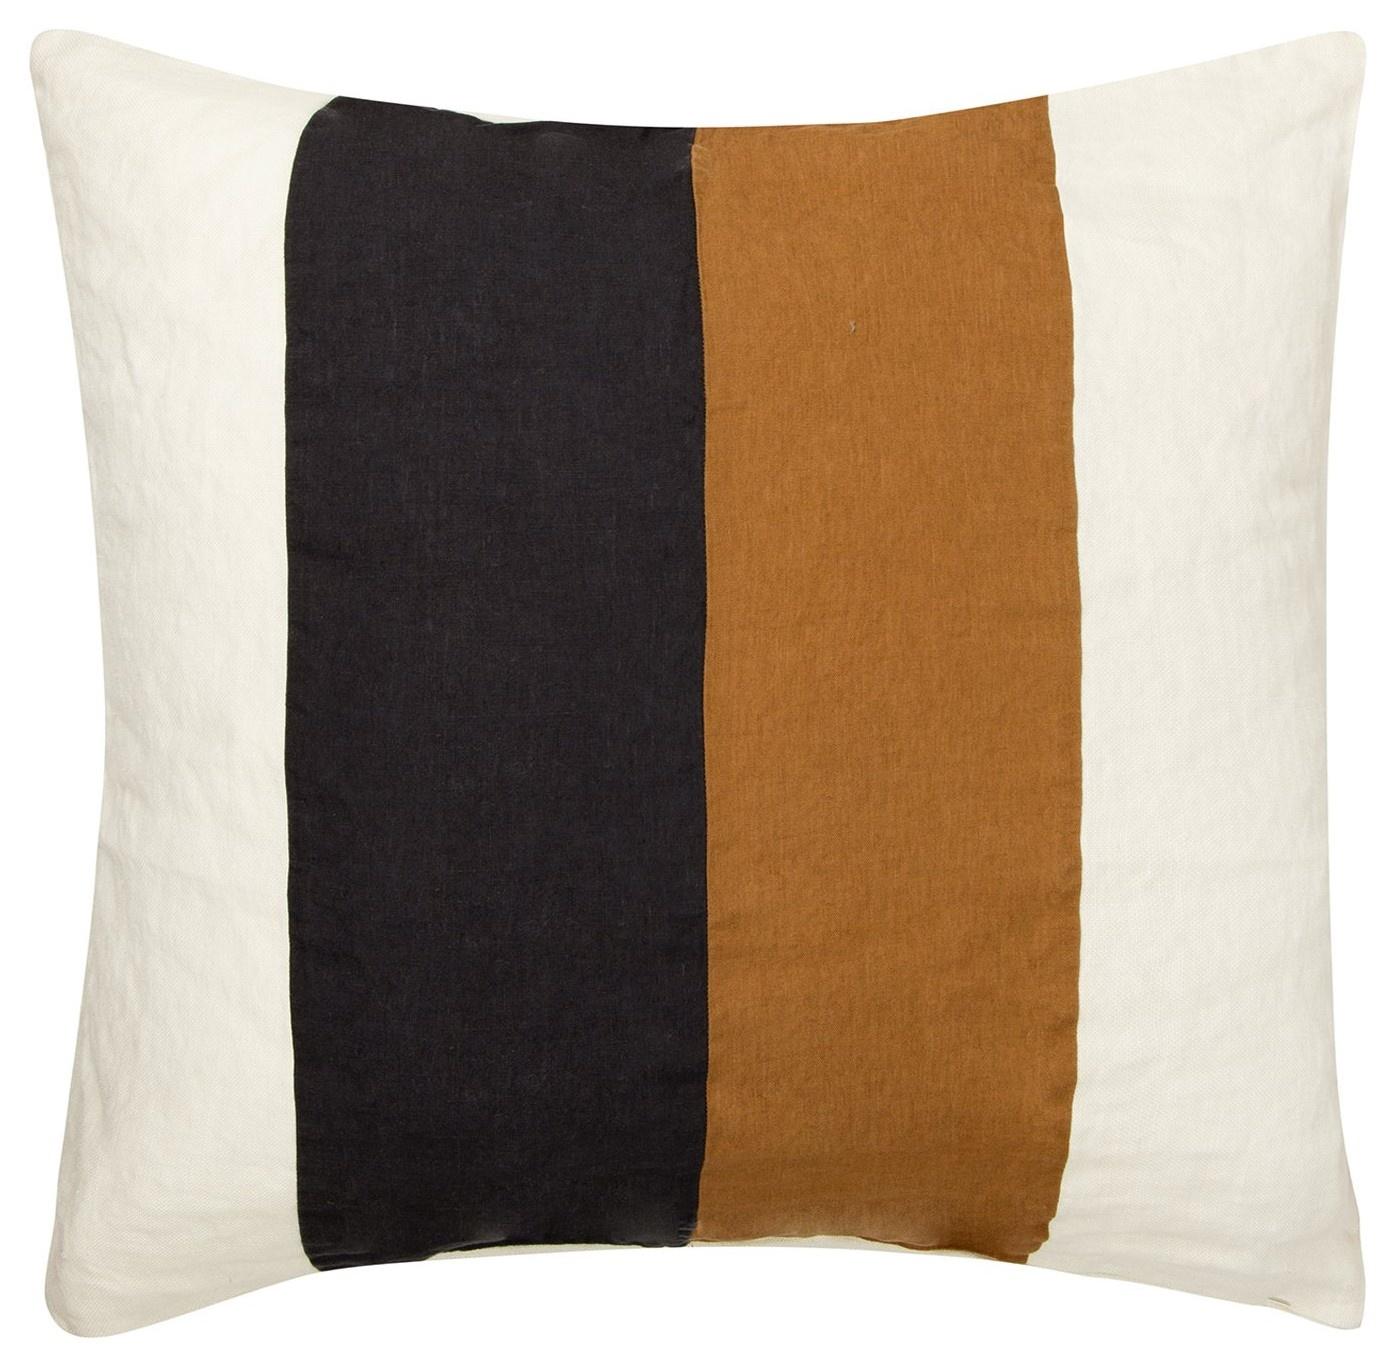 Kussenhoes Linen pillow square winter white-1